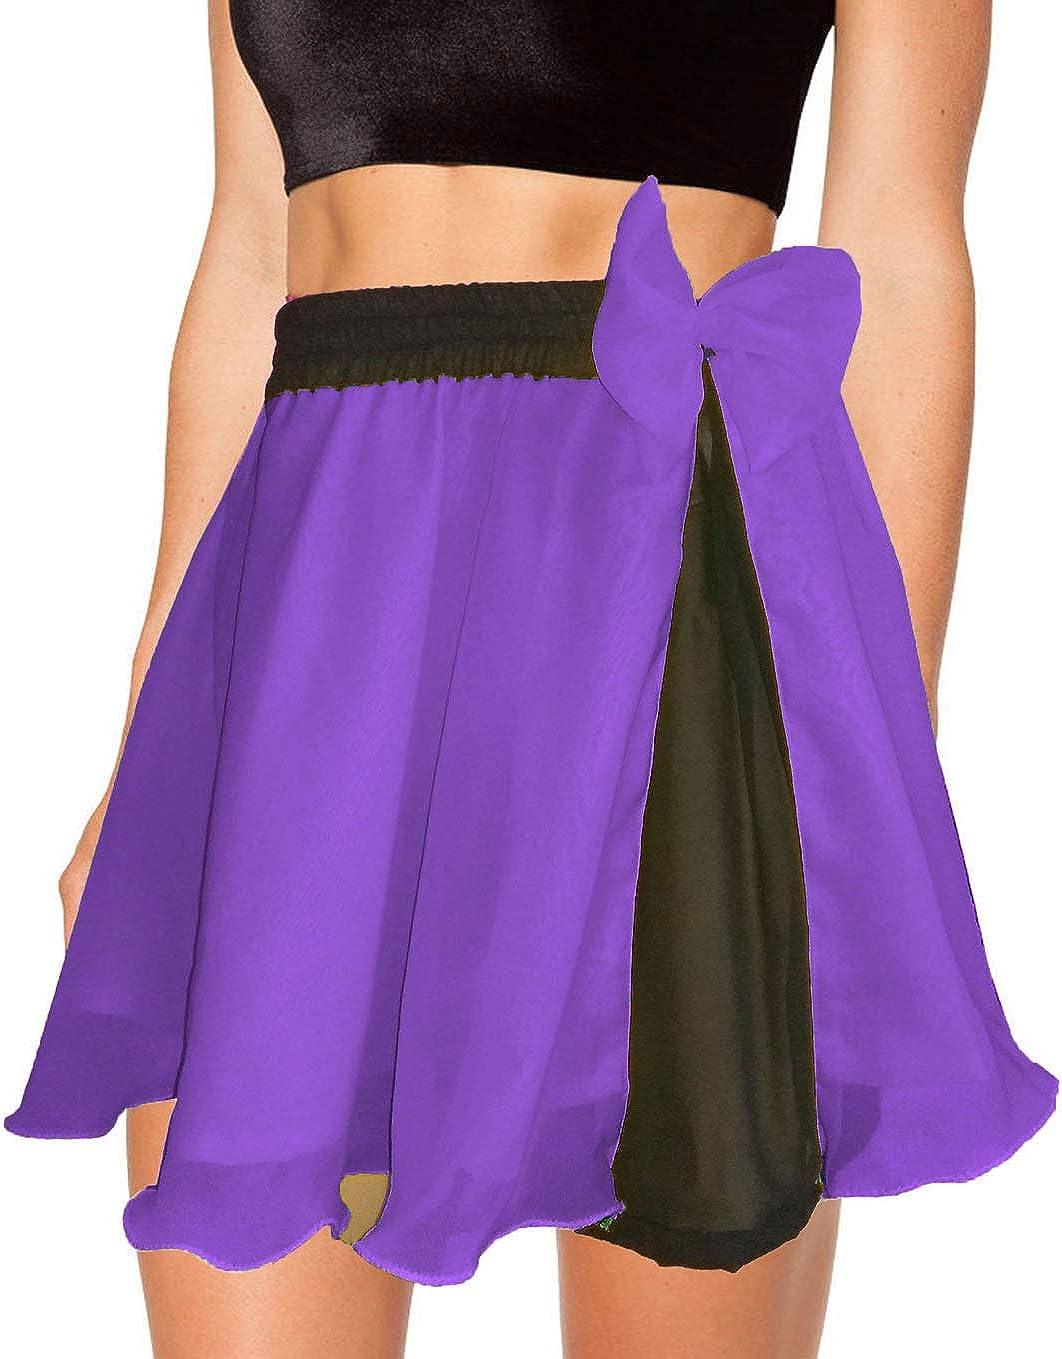 Meek Mercery Casual Wear Belly Dance Pleated Short Skirt Chiffon Short Skirt One Size C11